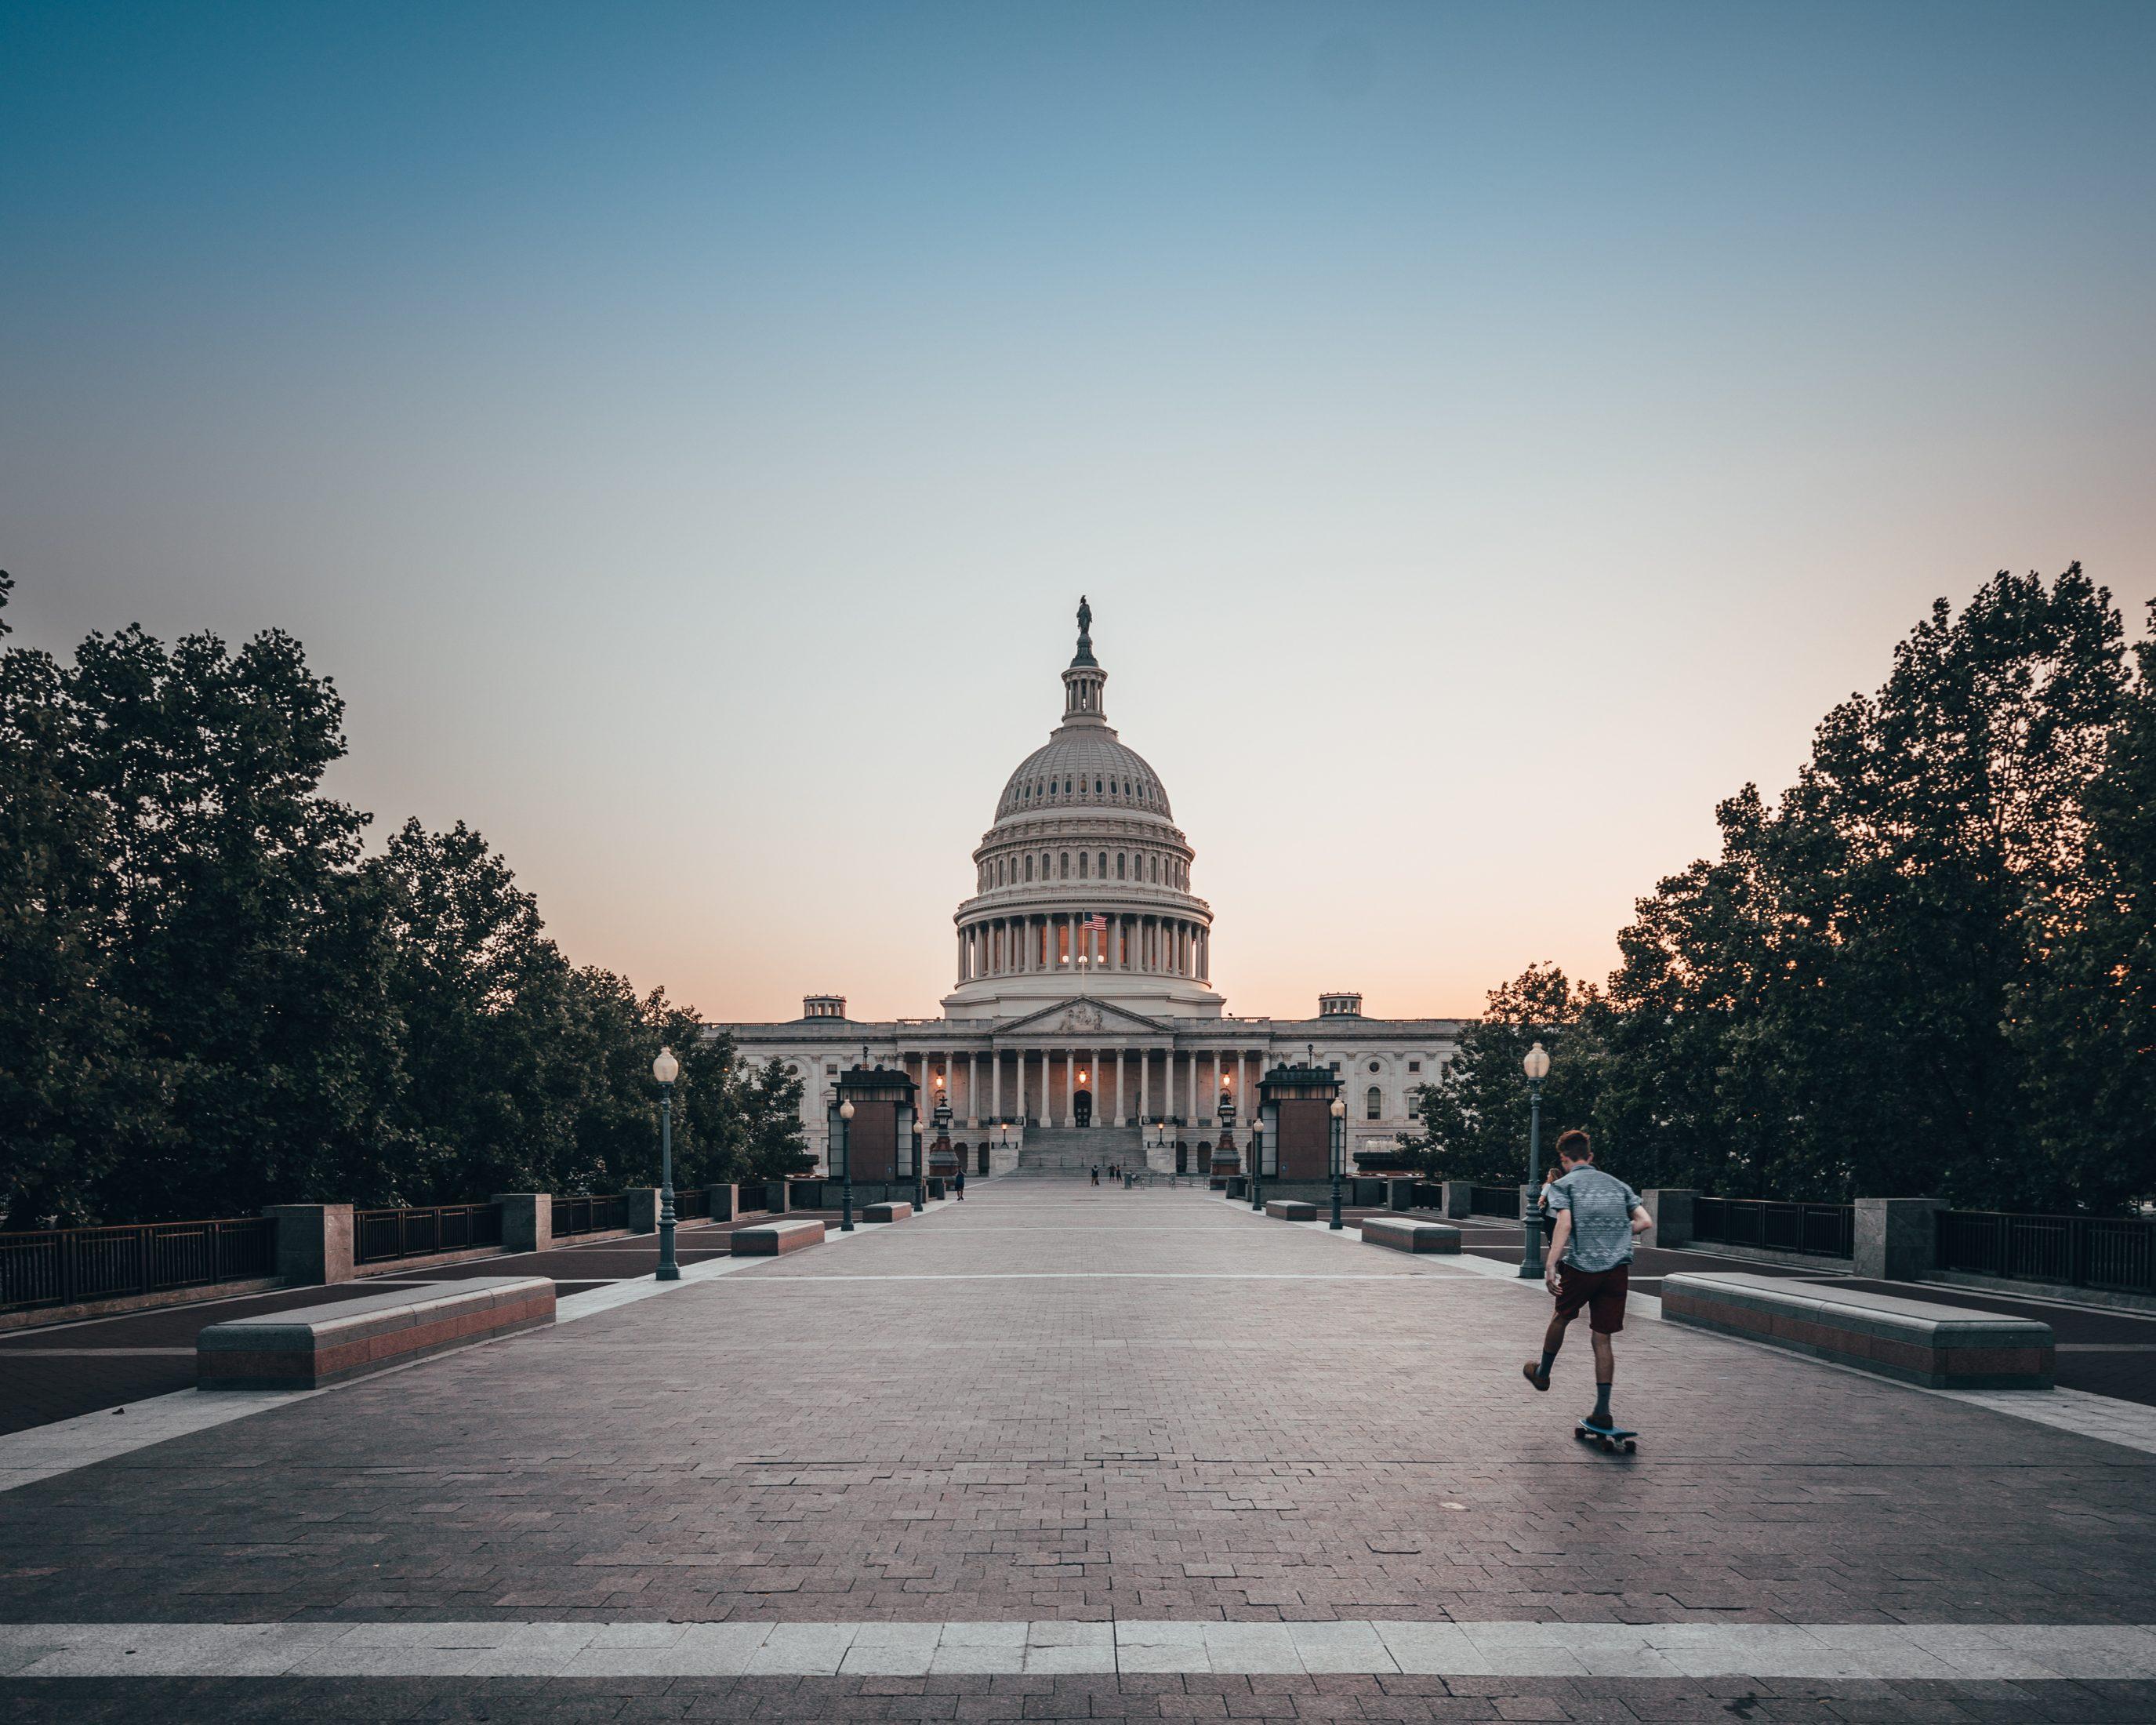 Us Capitol Skateboarder